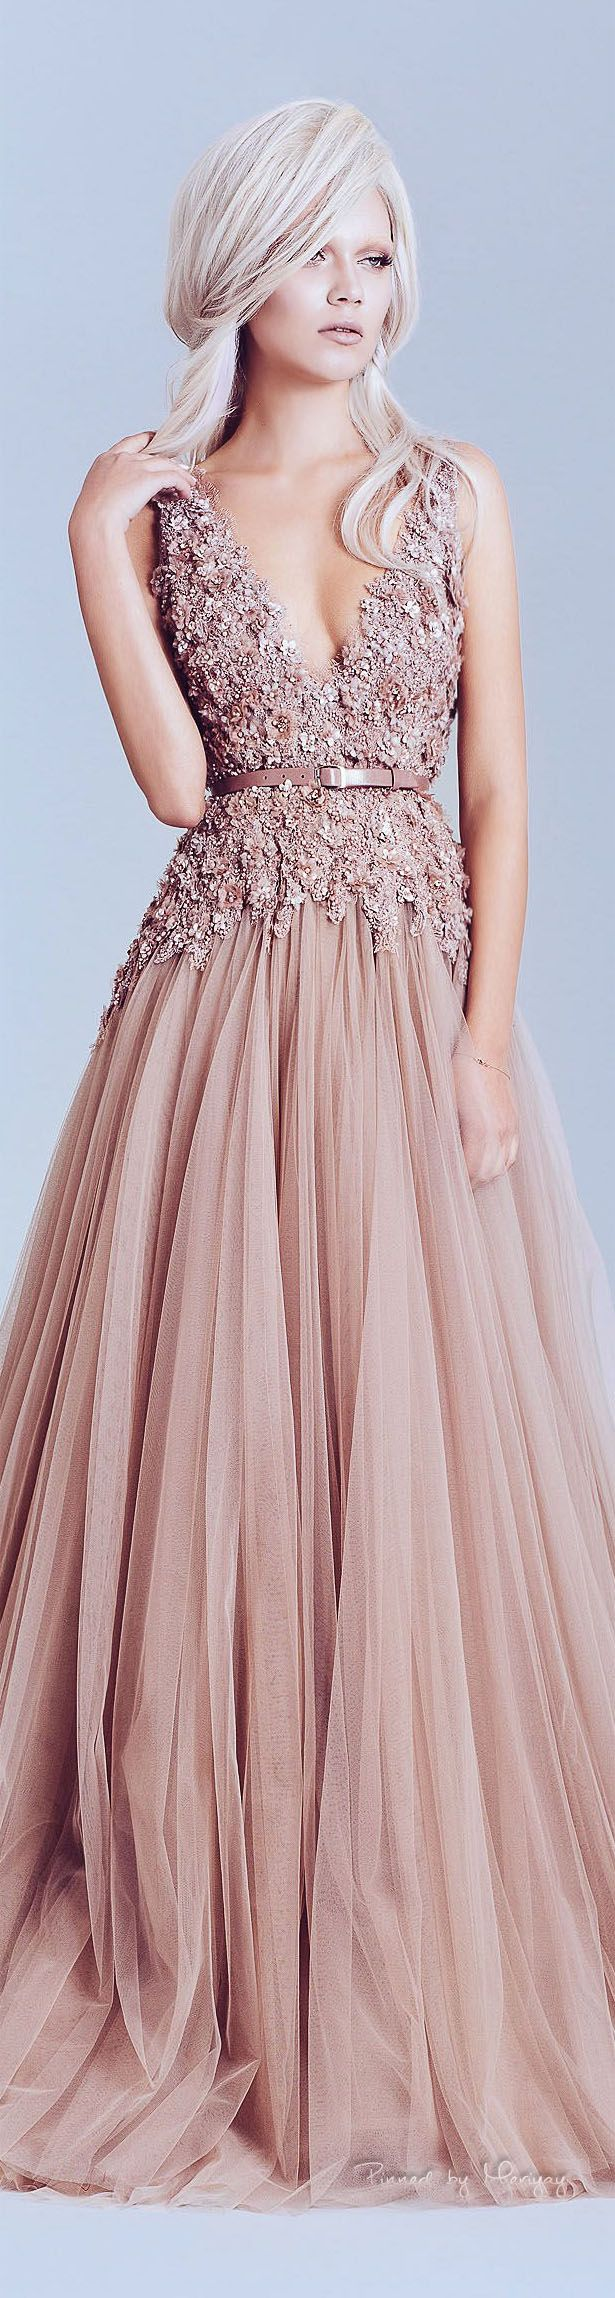 Alfazairy Spring-summer 2015. #gorgeous #dress bridesmaid dresses, sequin bridesmaid dresses More